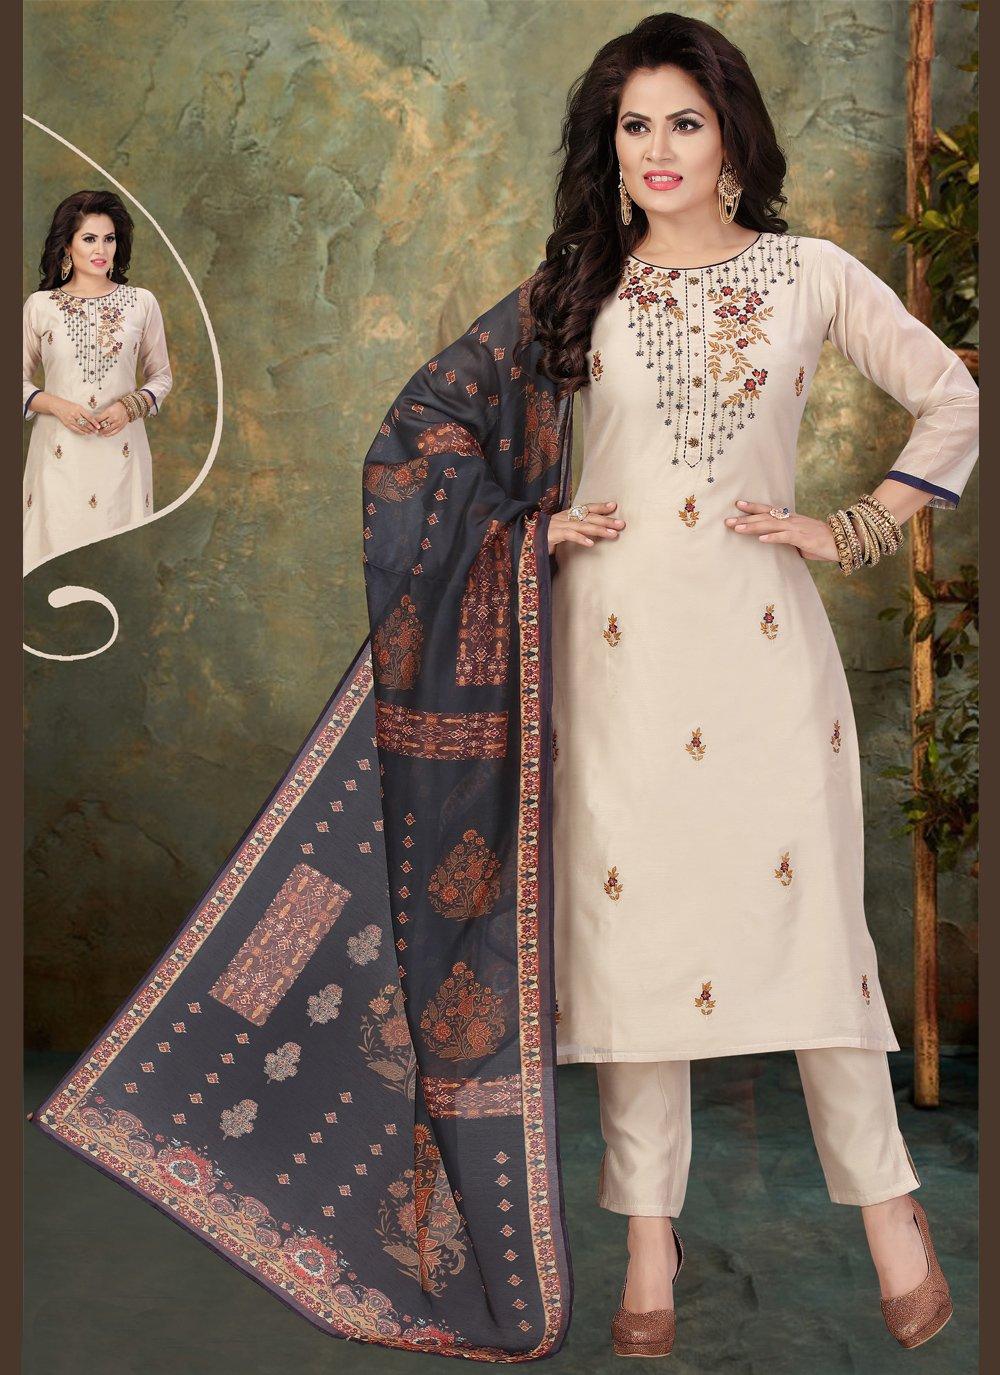 Chanderi Beige Readymade Suit